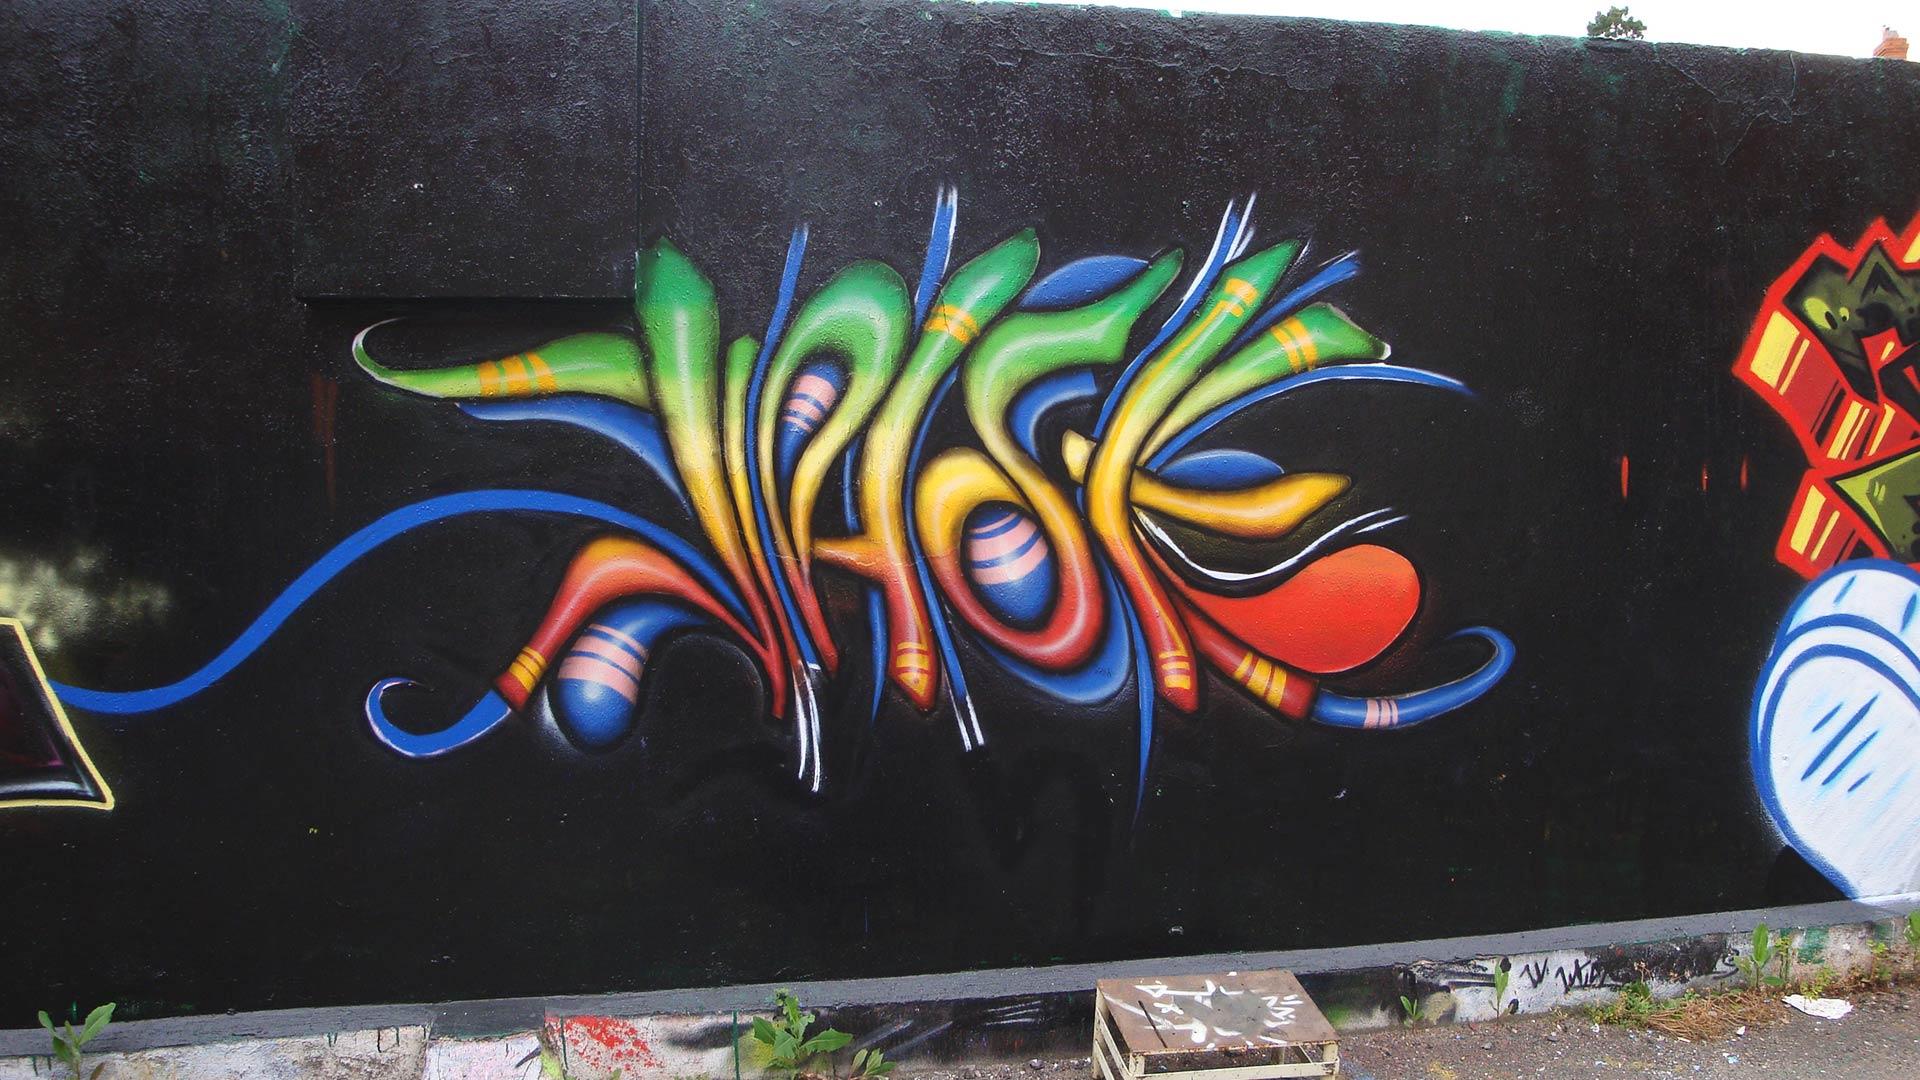 Tase graffiti